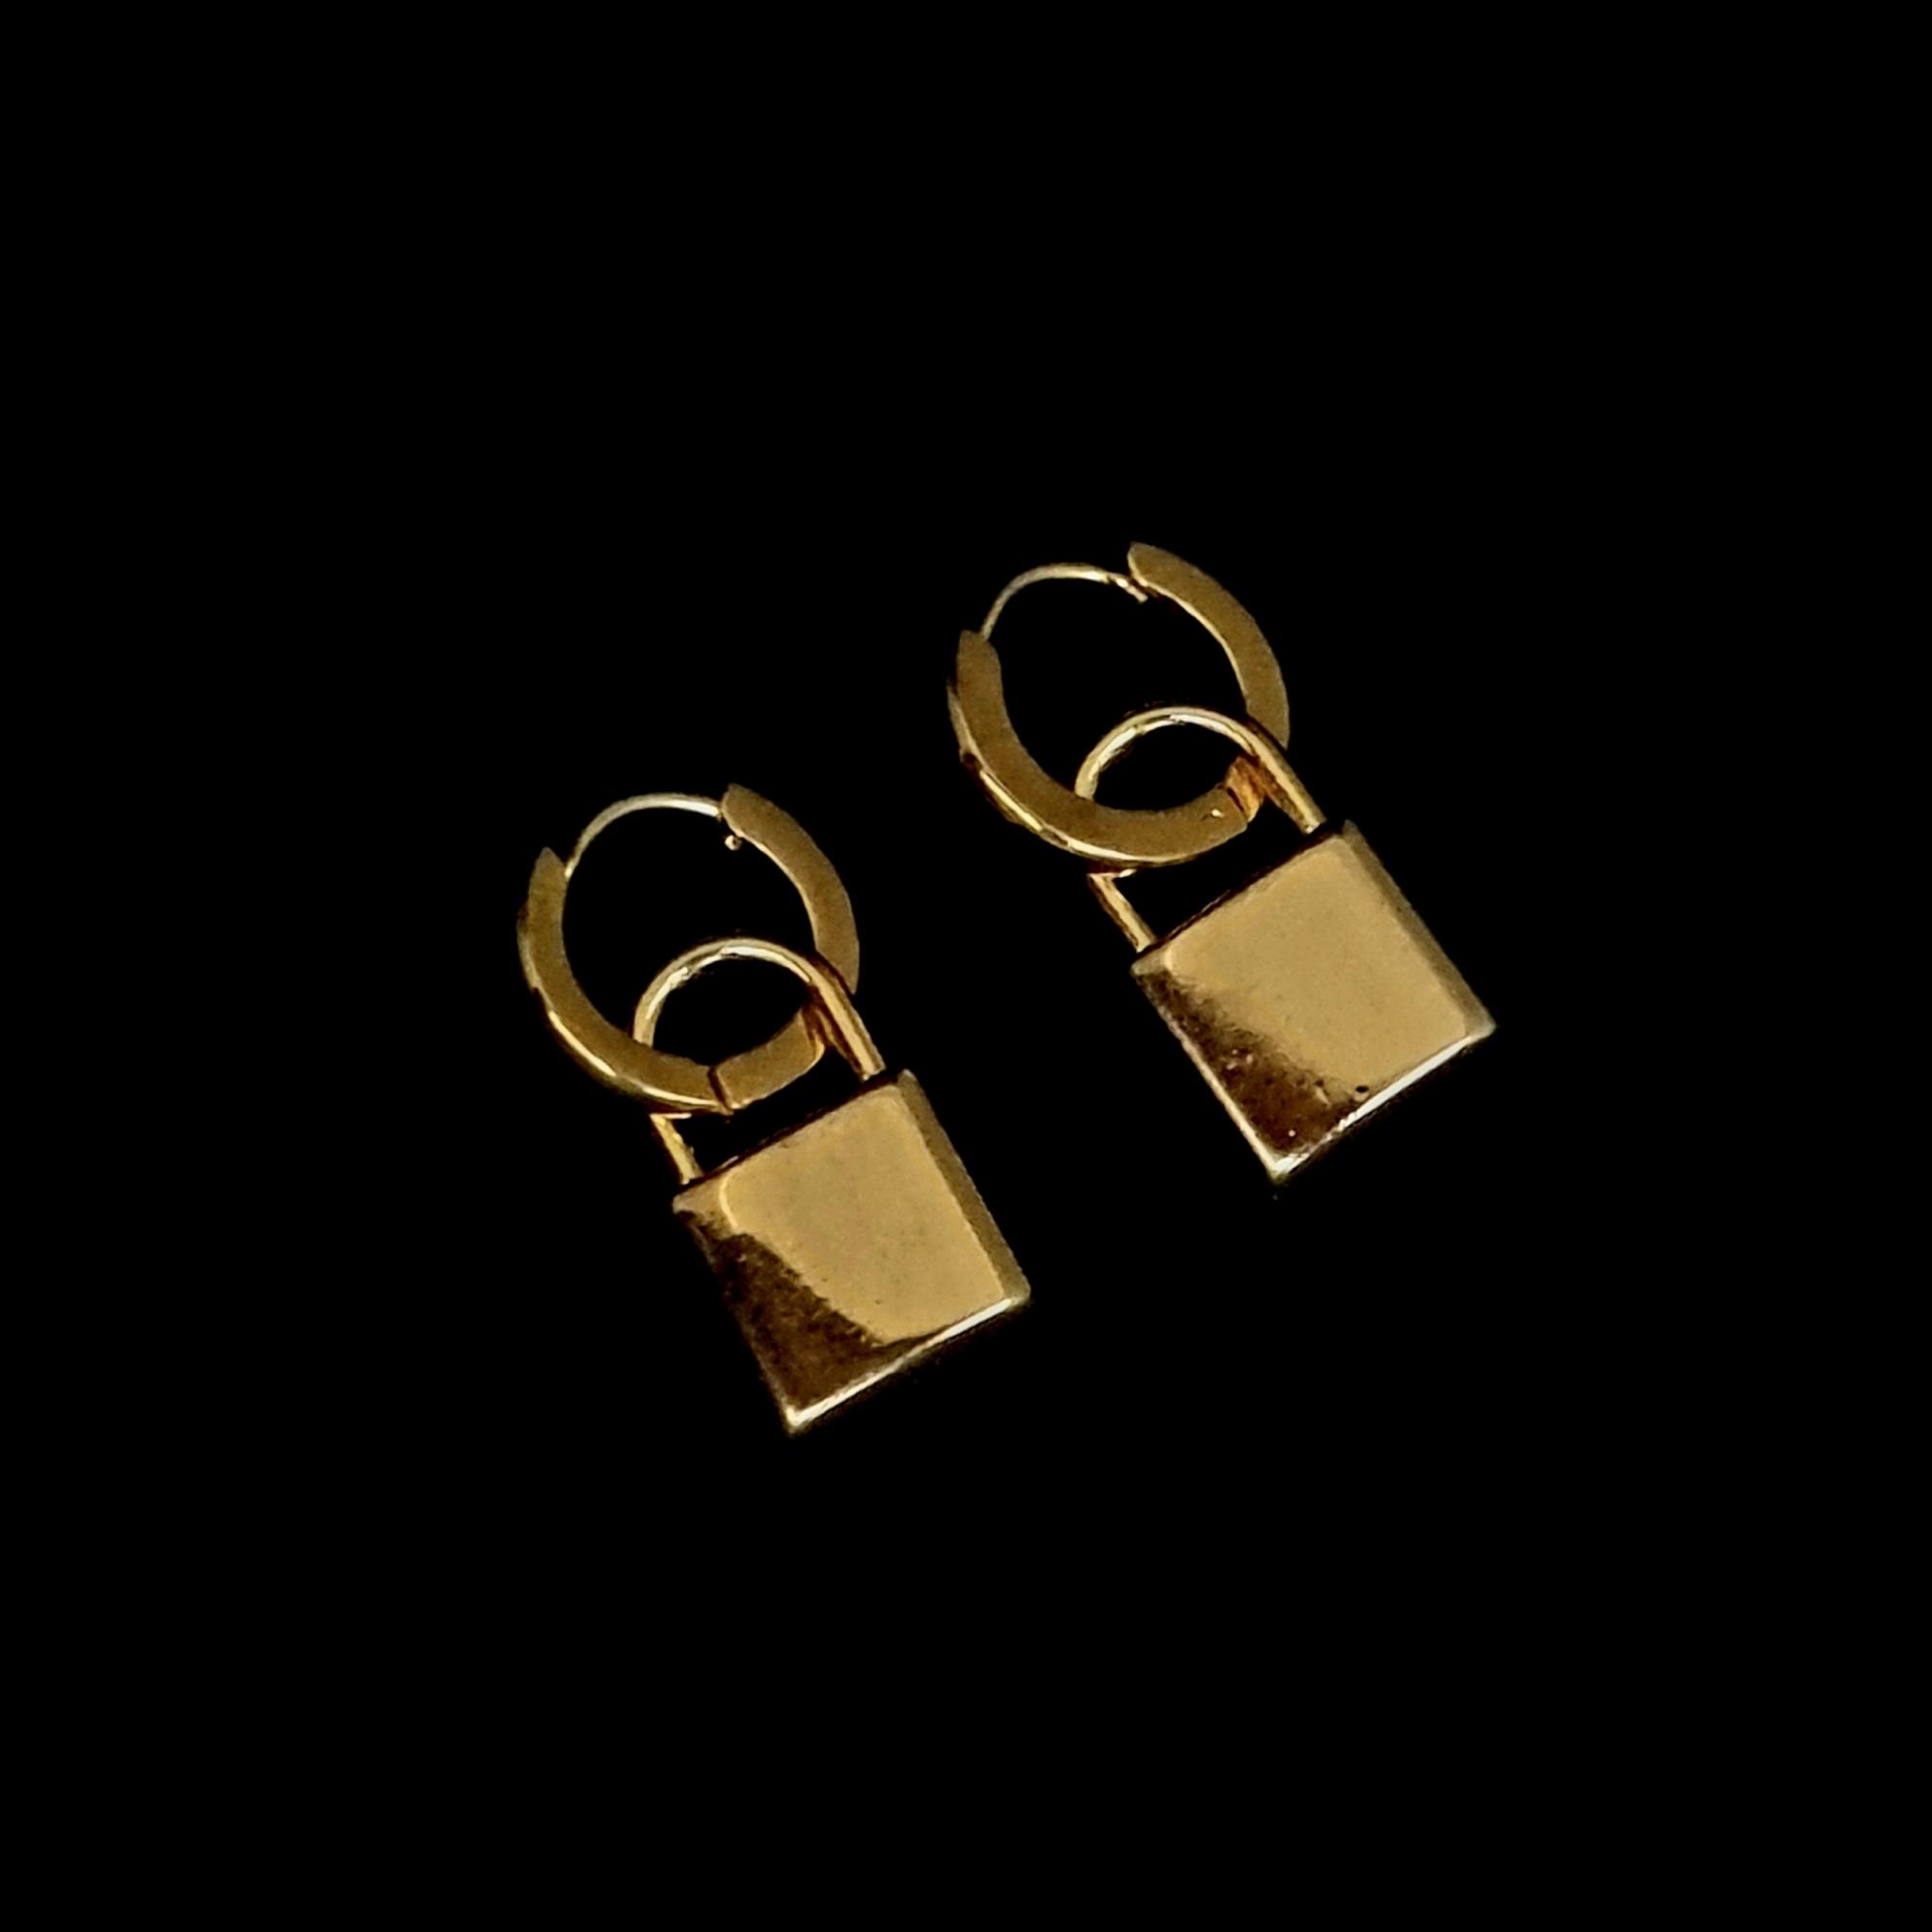 Brinco Aço Inox Lock Gold